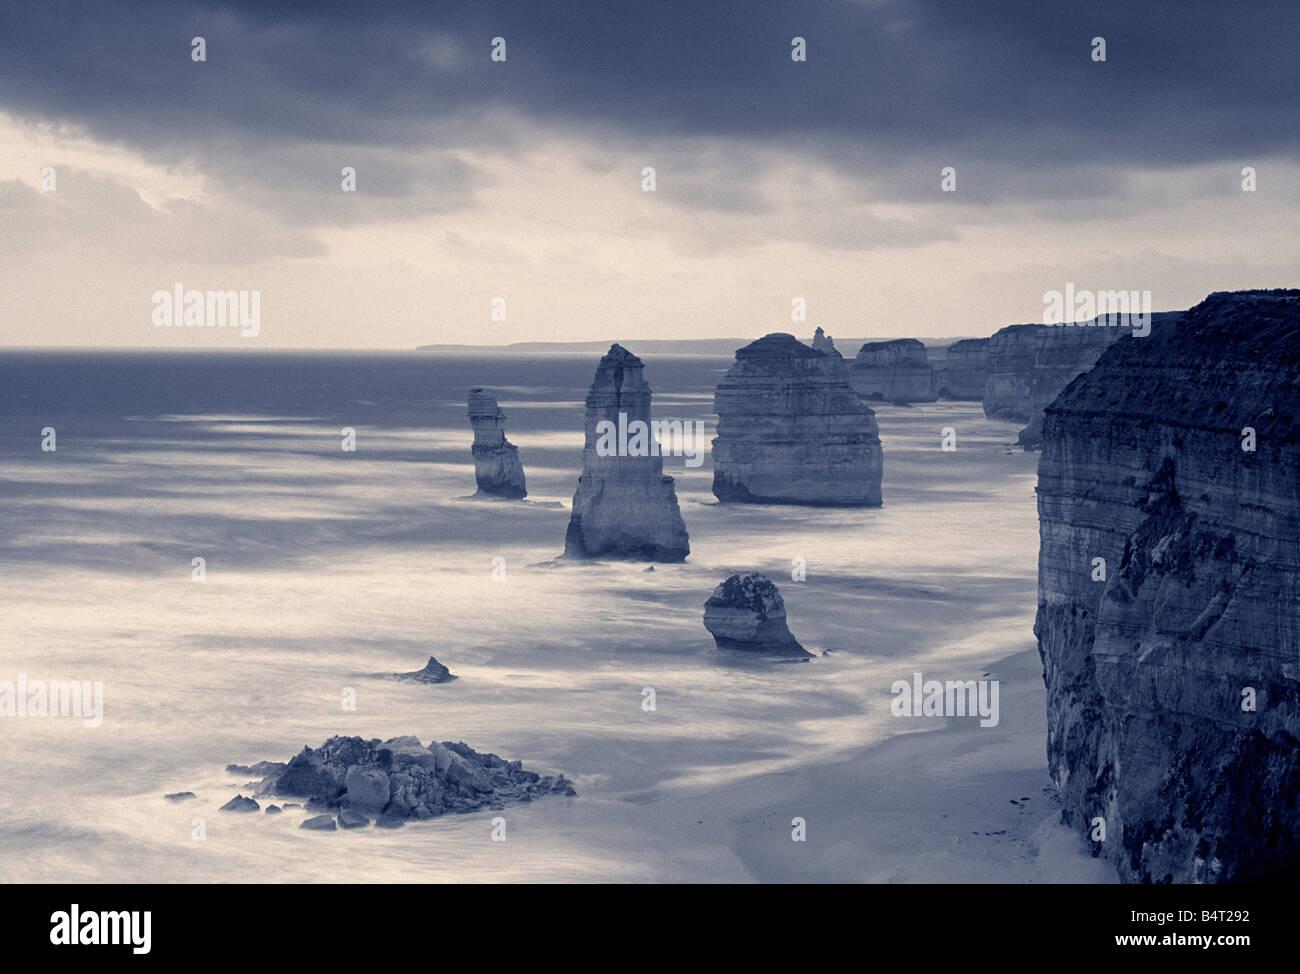 Douze Apôtres, Victoria, Australie Photo Stock